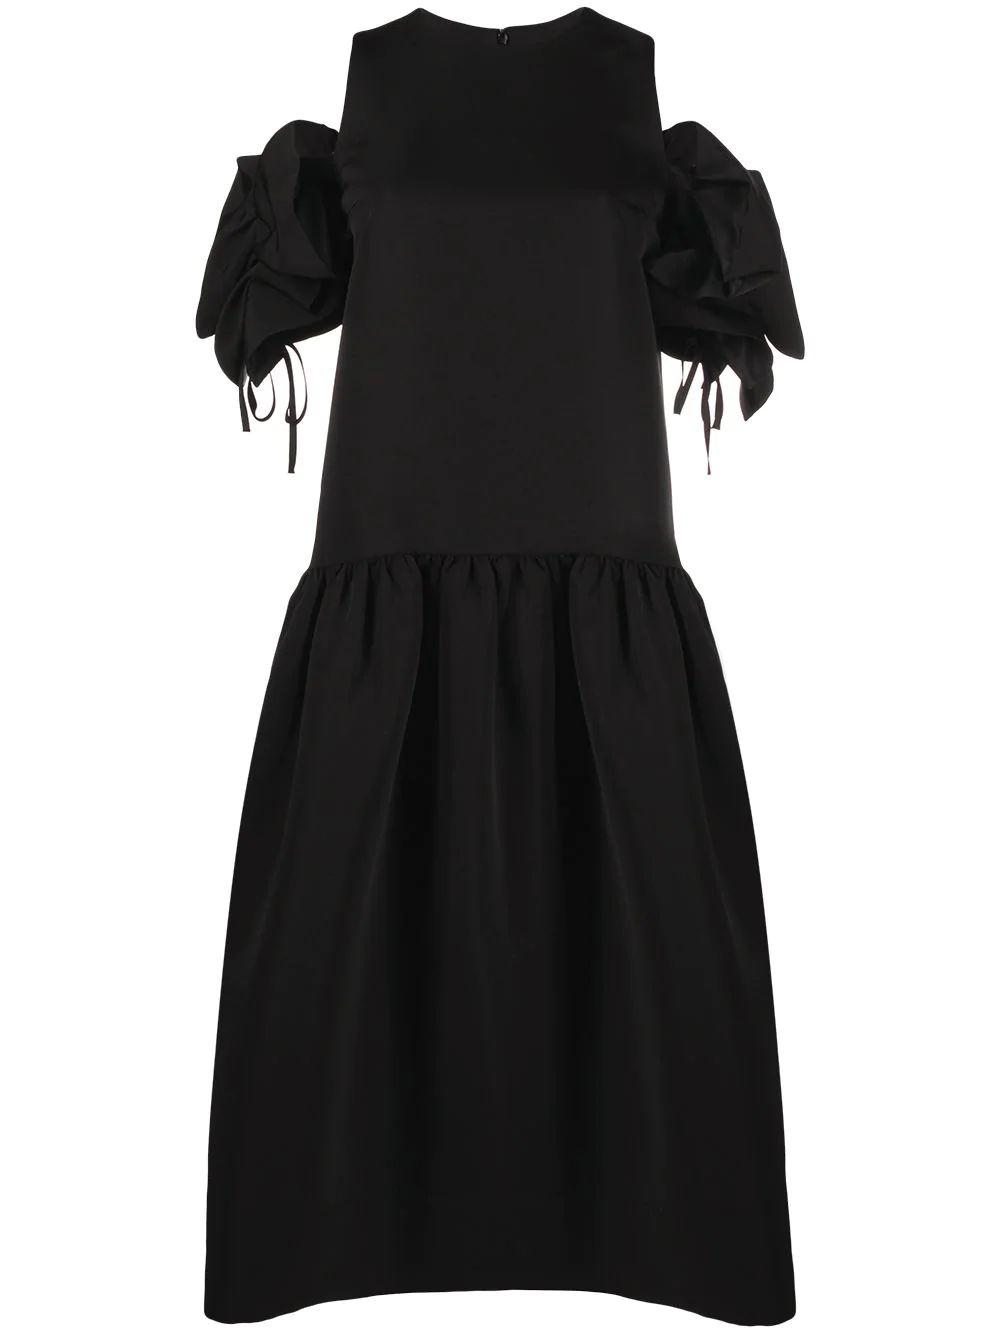 Drop Waist Dress With Ruffle Sleeves